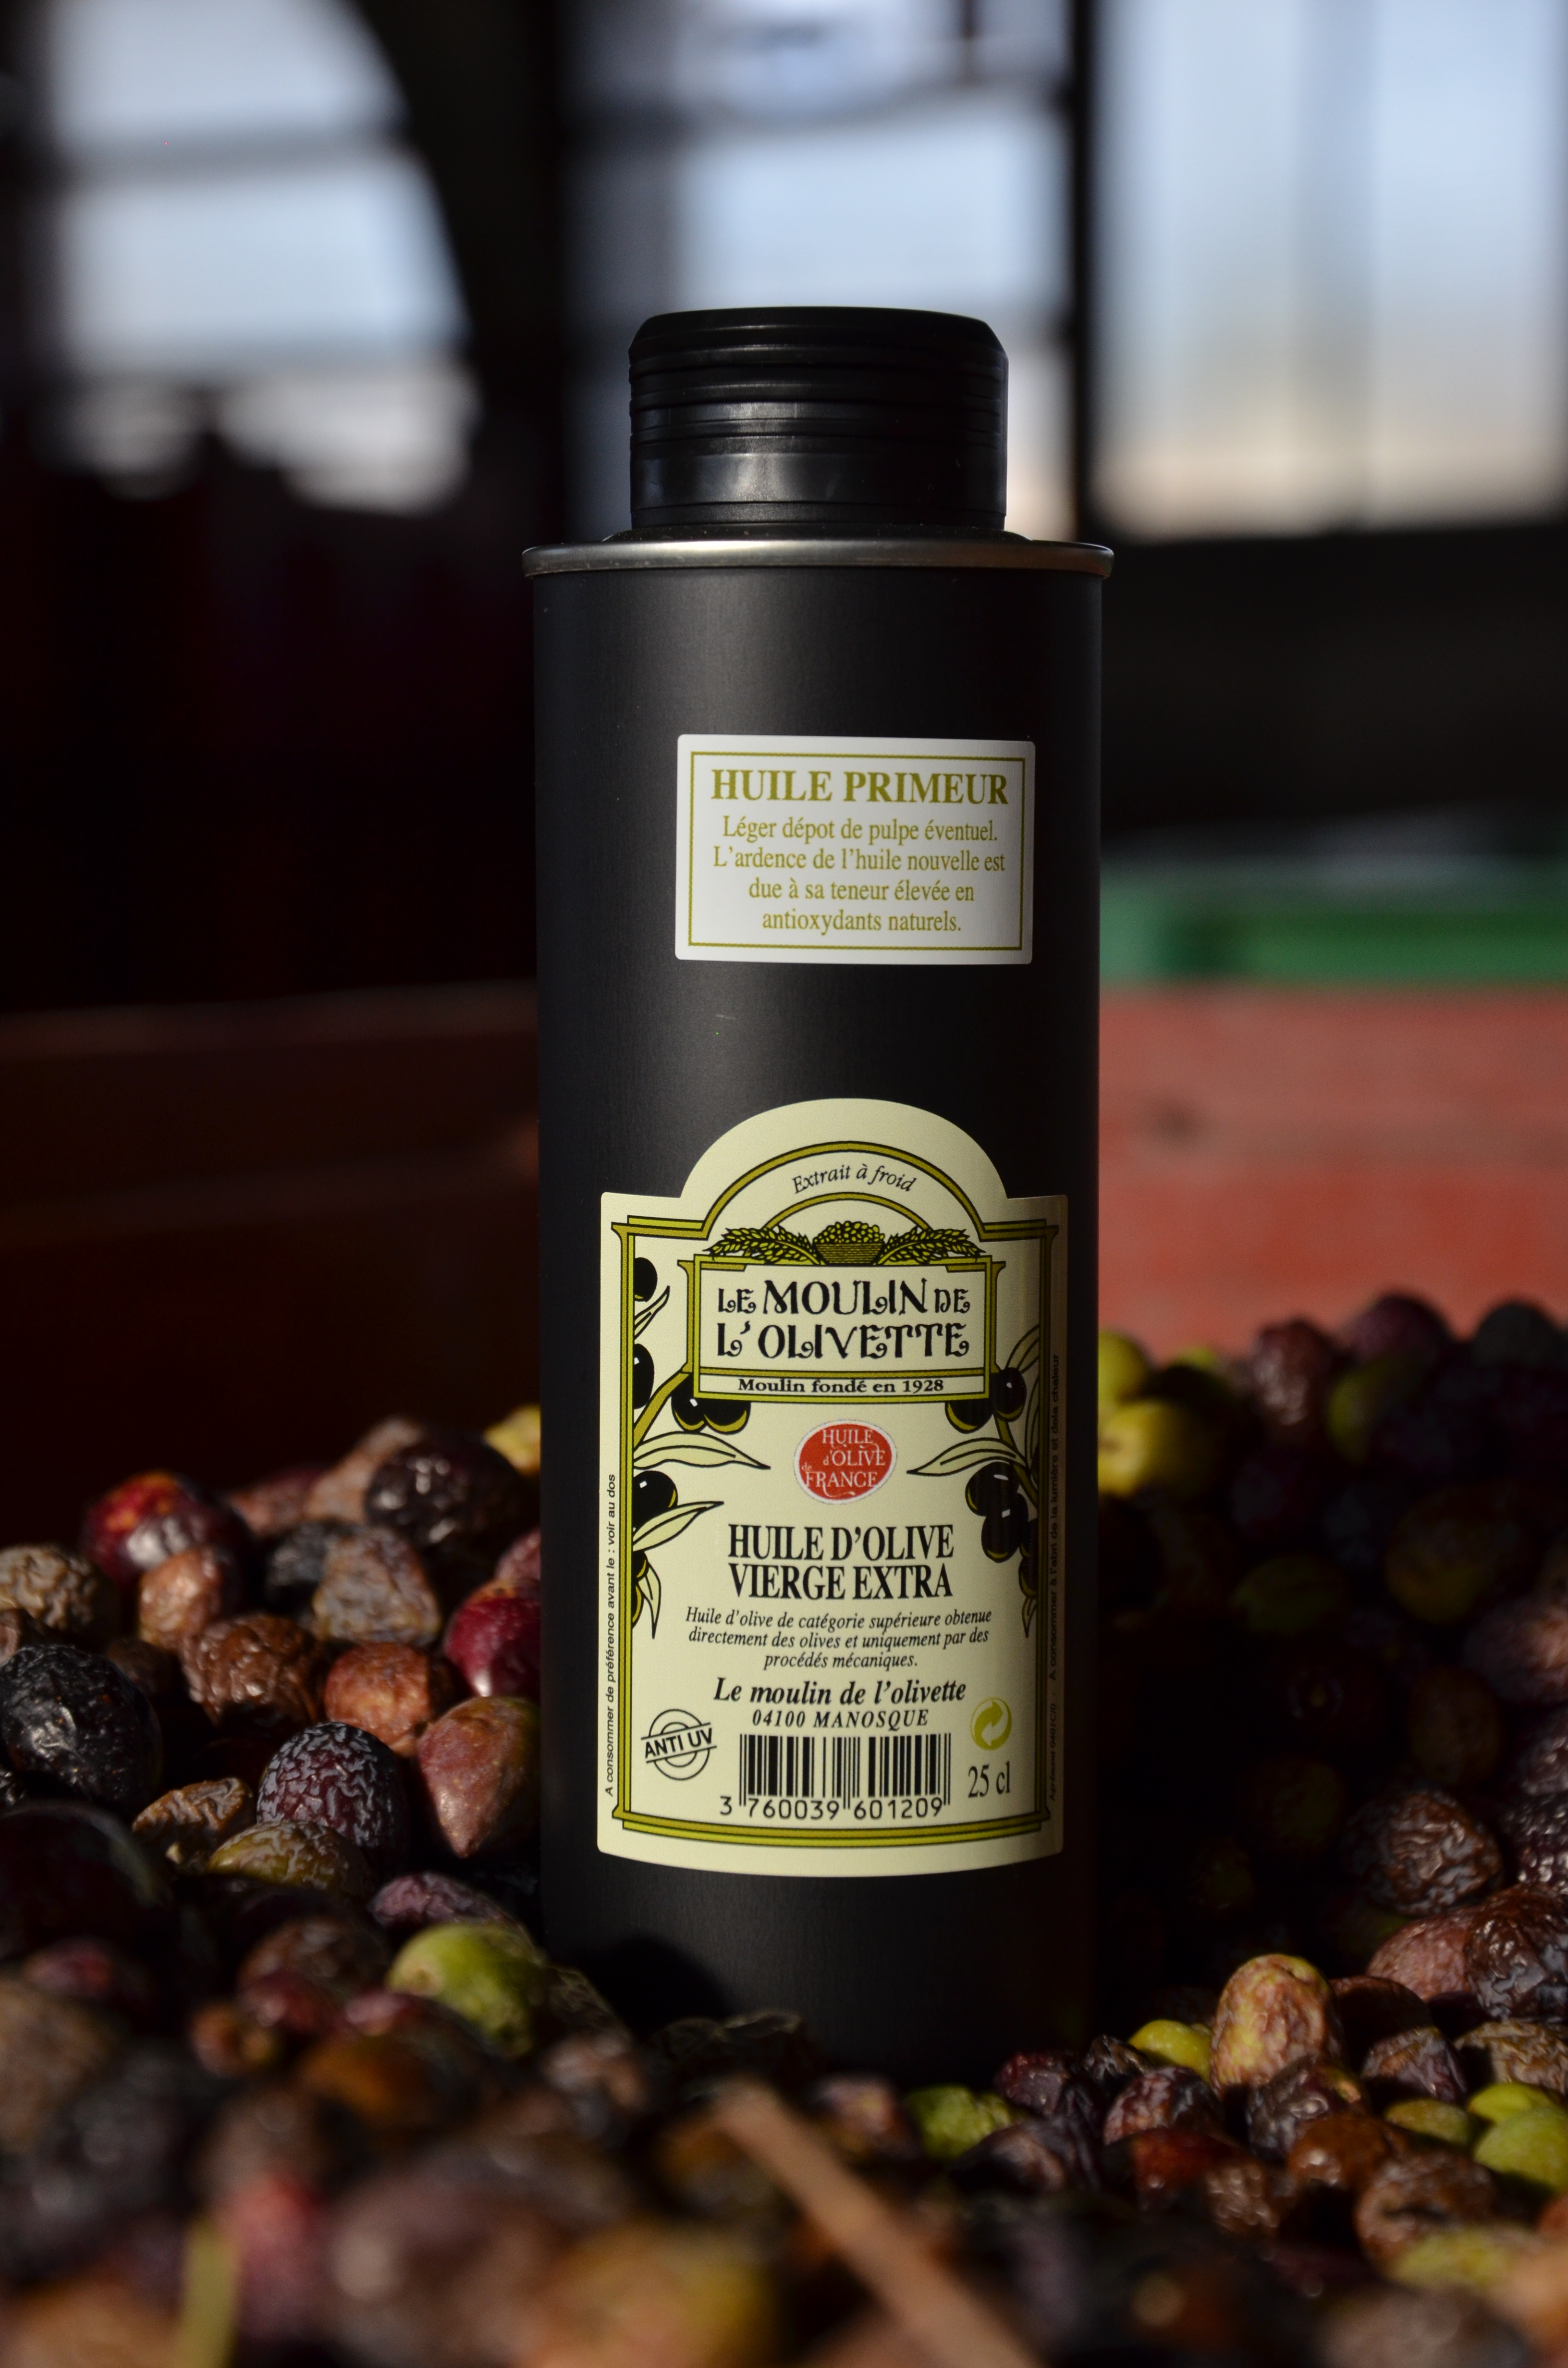 huile d 39 olive v extra du midi de la france huile d 39 olive de provence aoc en vente. Black Bedroom Furniture Sets. Home Design Ideas